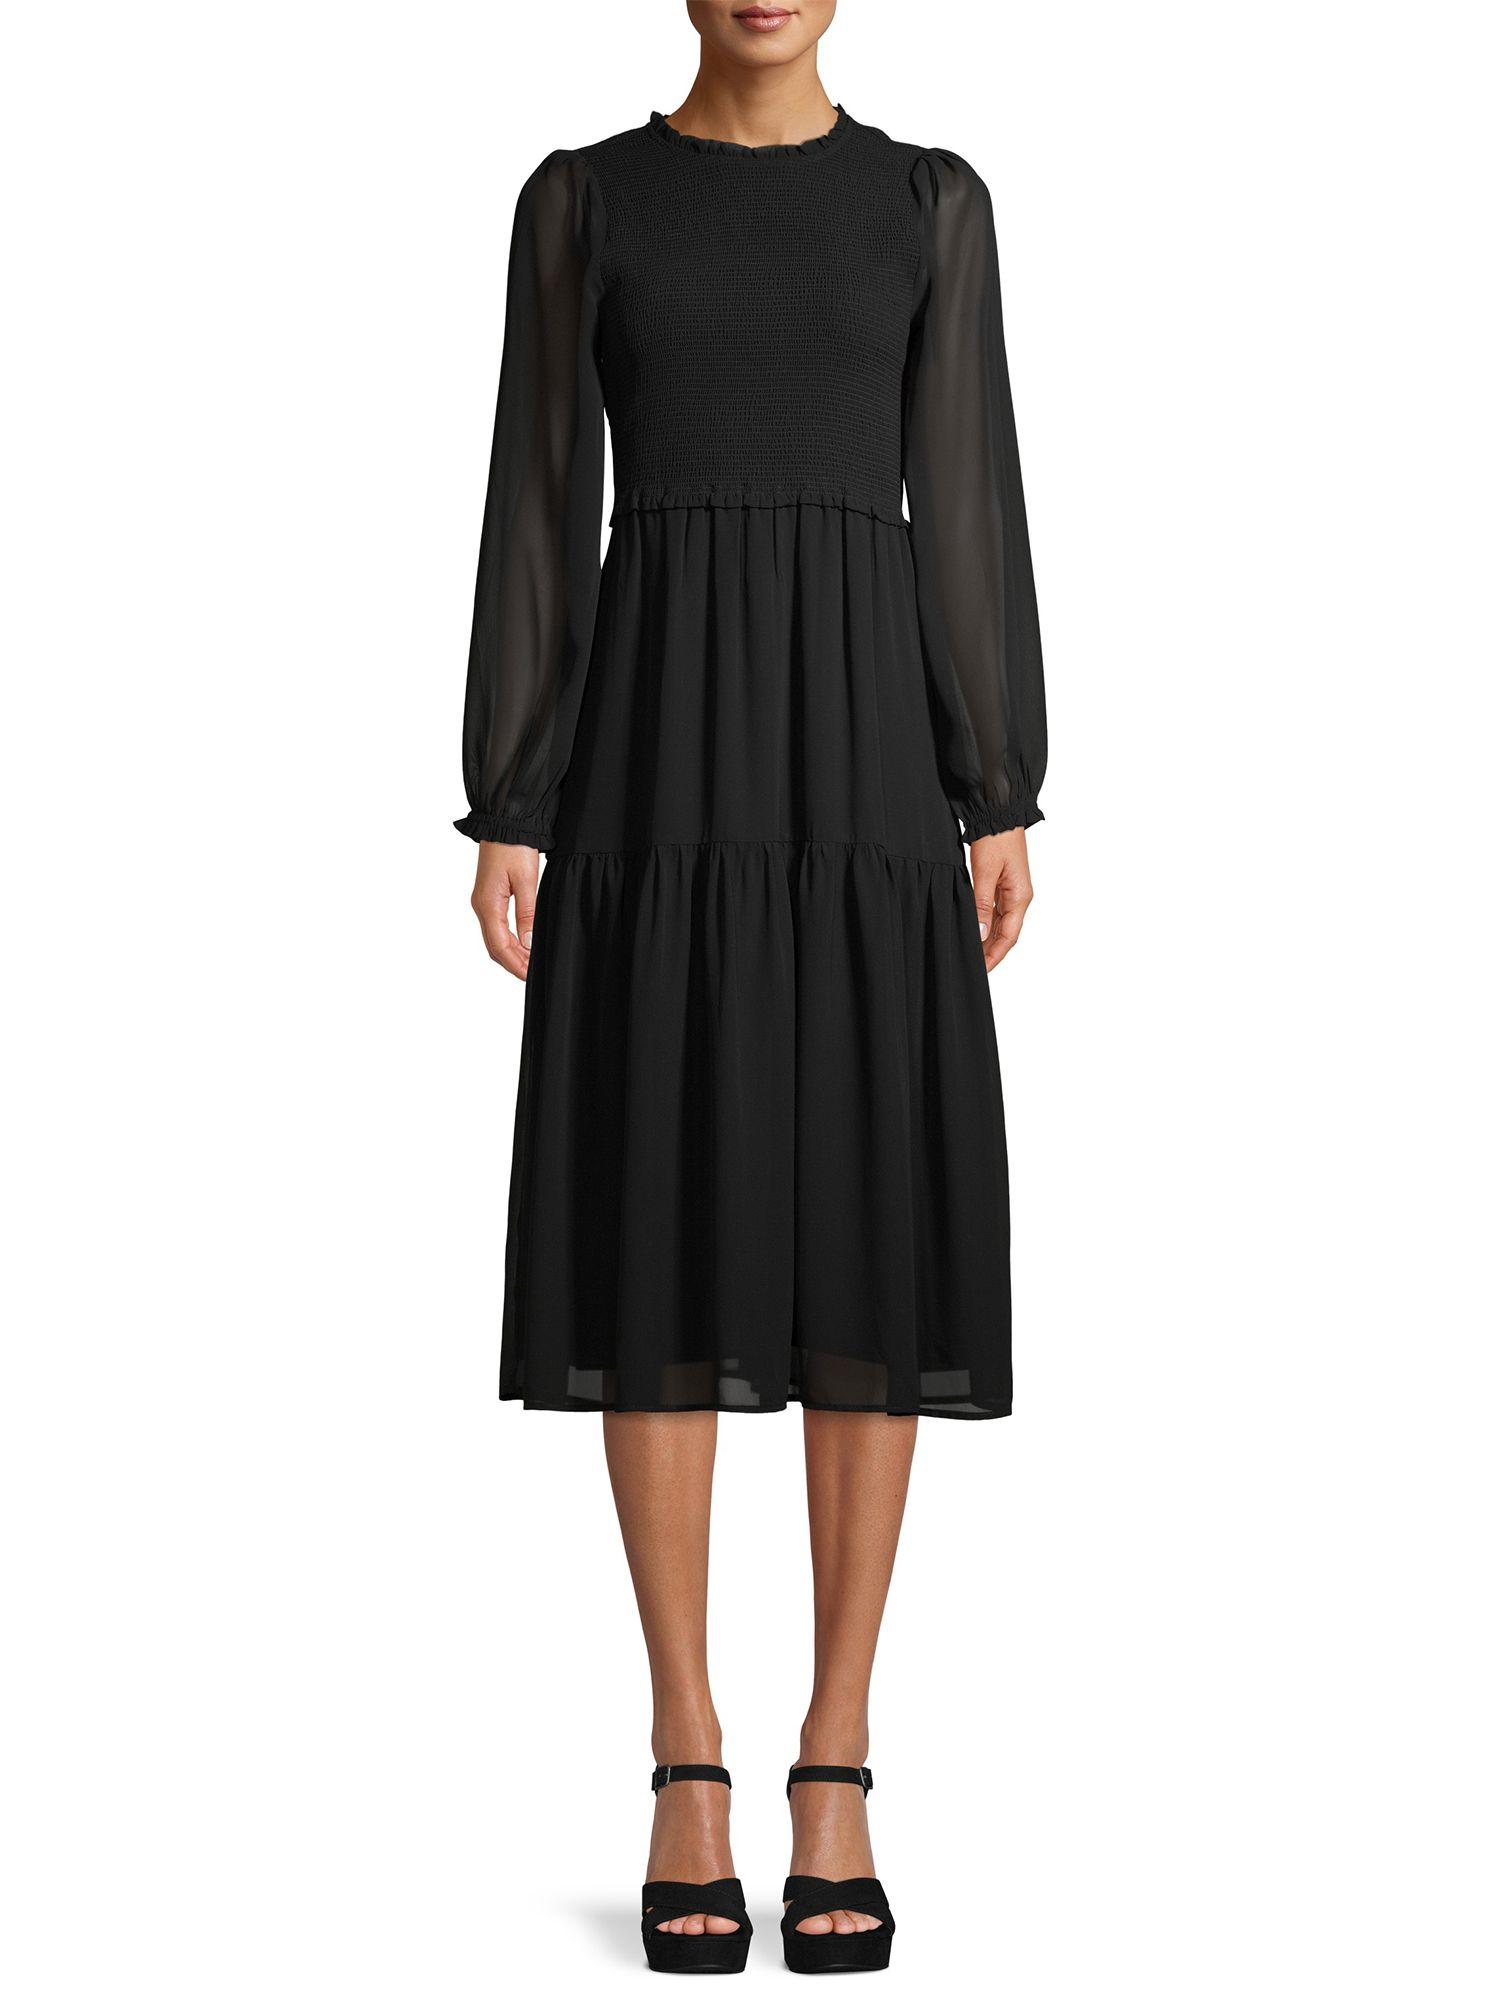 Time And Tru Time And Tru Women S Long Sleeve Smocked Tiered Dress Walmart Com Tiered Dress Tiered Midi Dress Dresses [ 2000 x 1500 Pixel ]